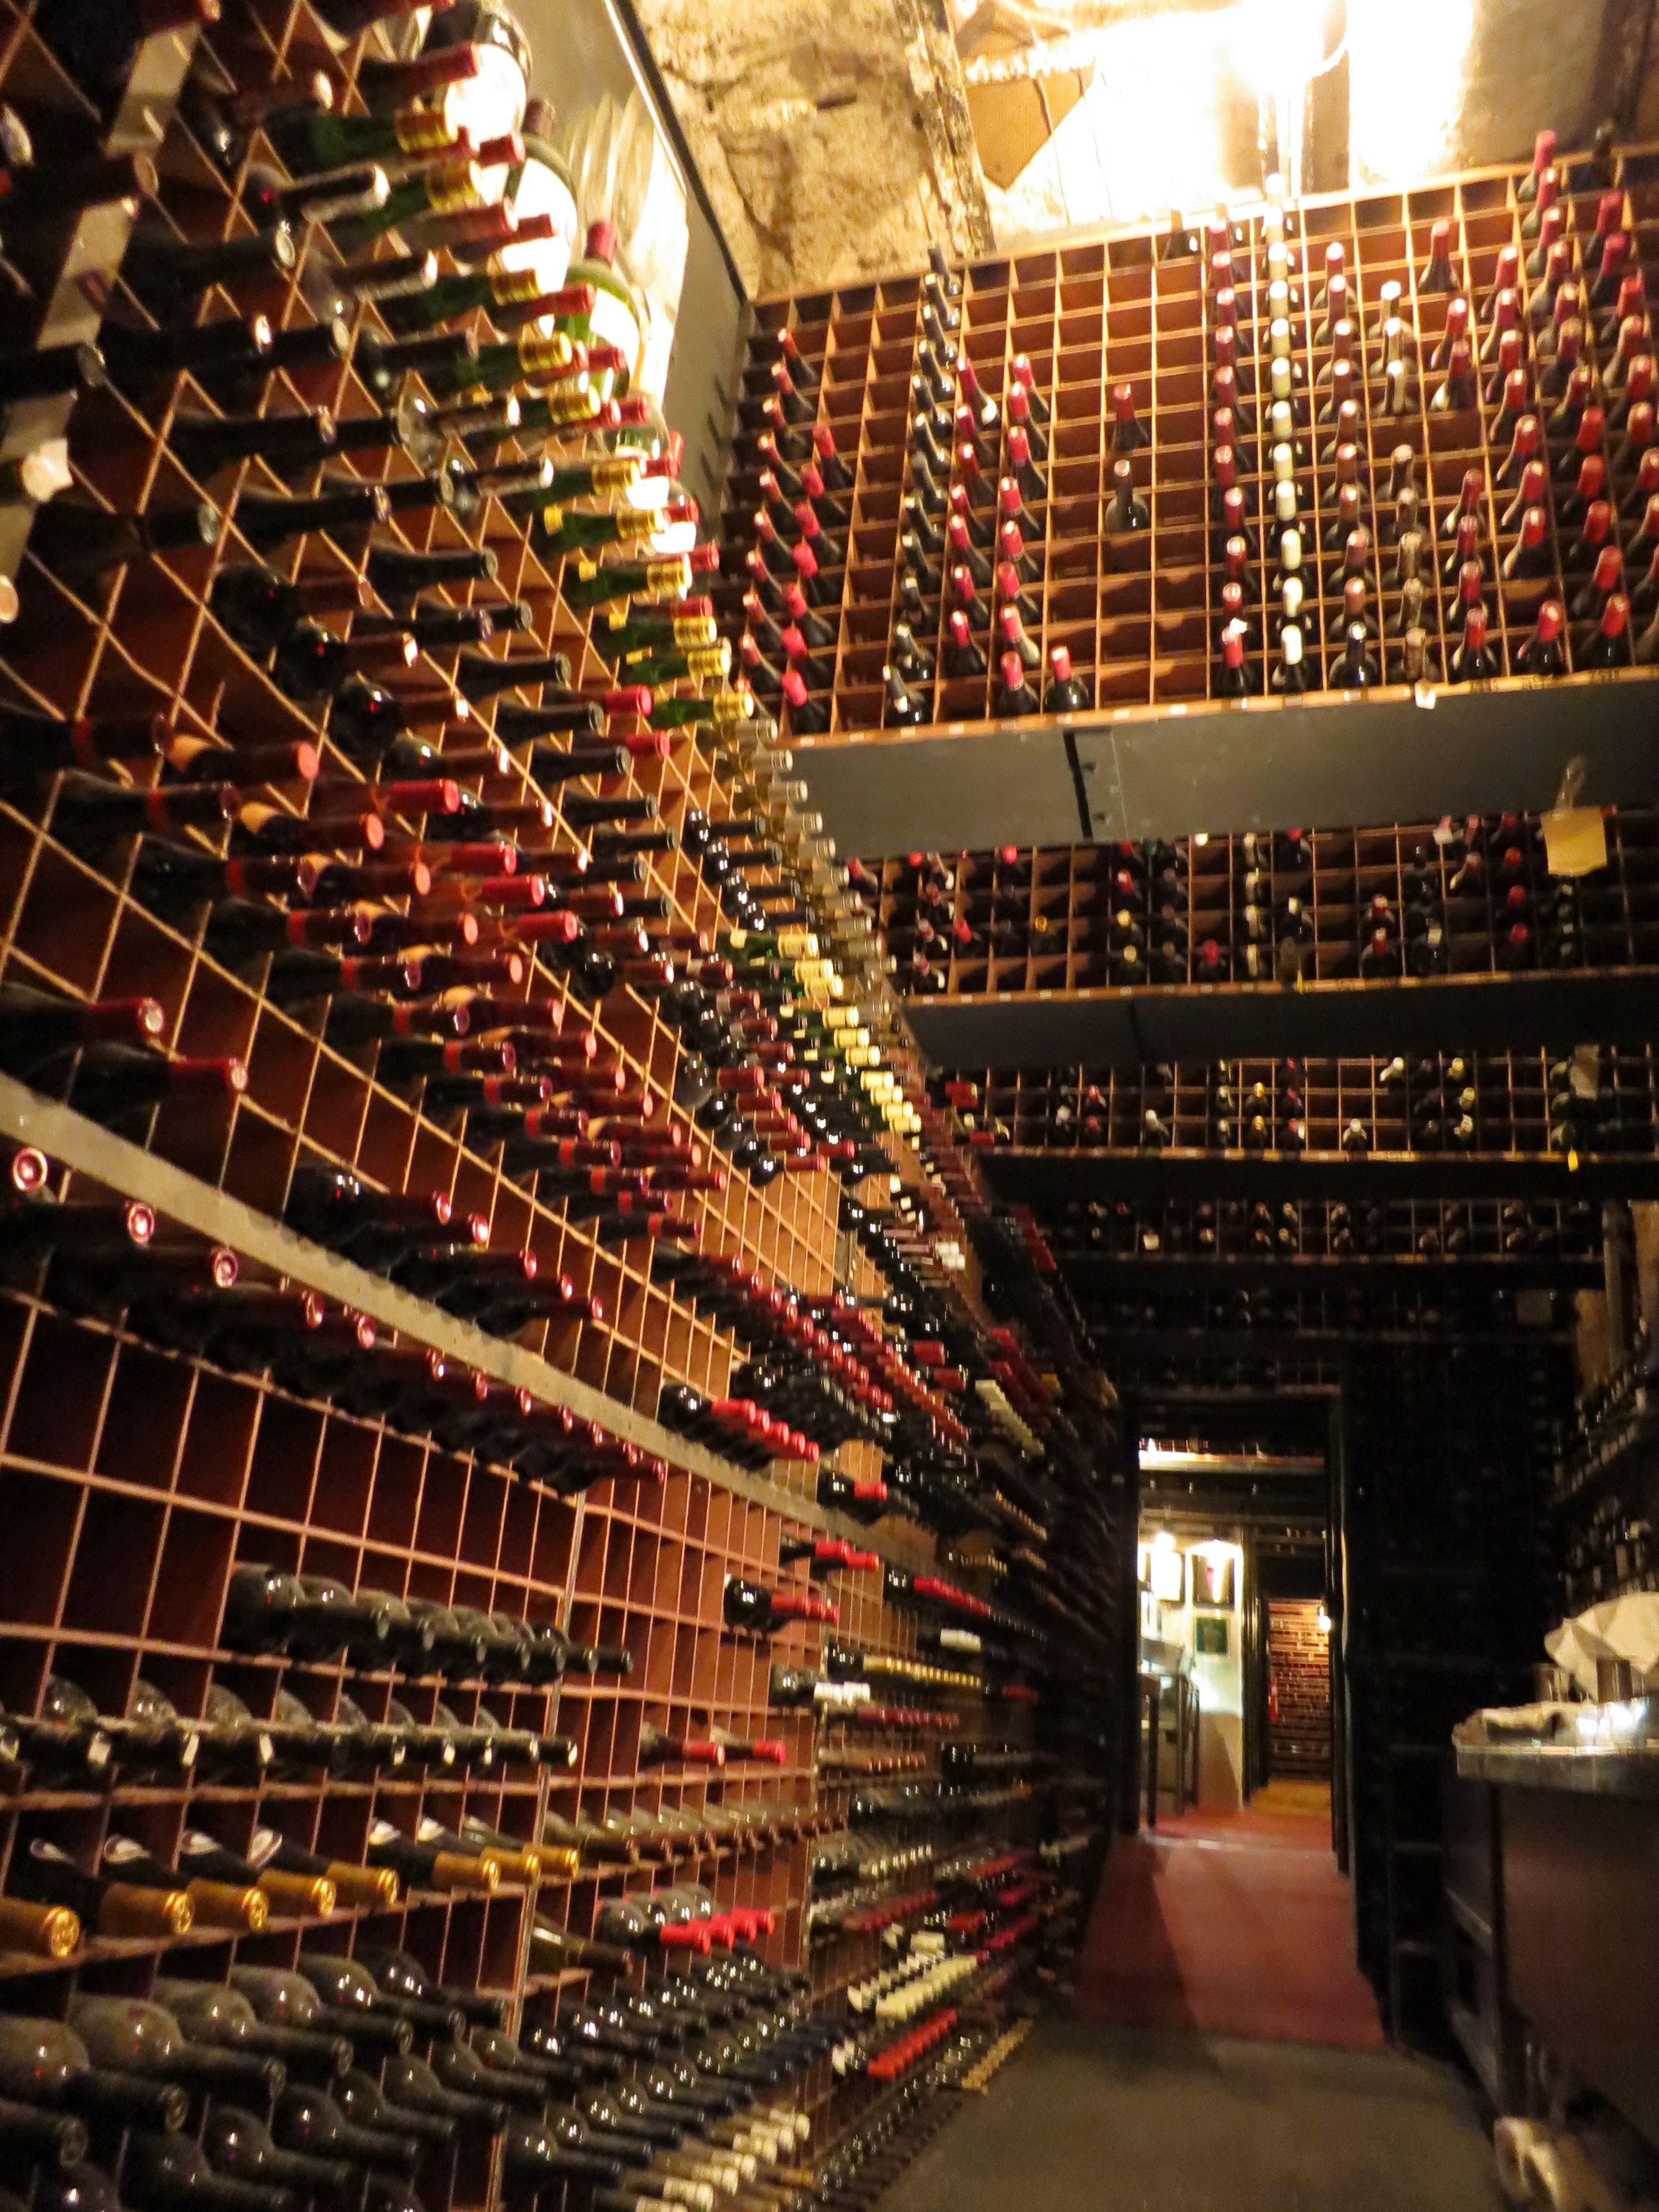 The Wine Cellar Gayot S Blog Bortarolas Wine Cellar Tampa